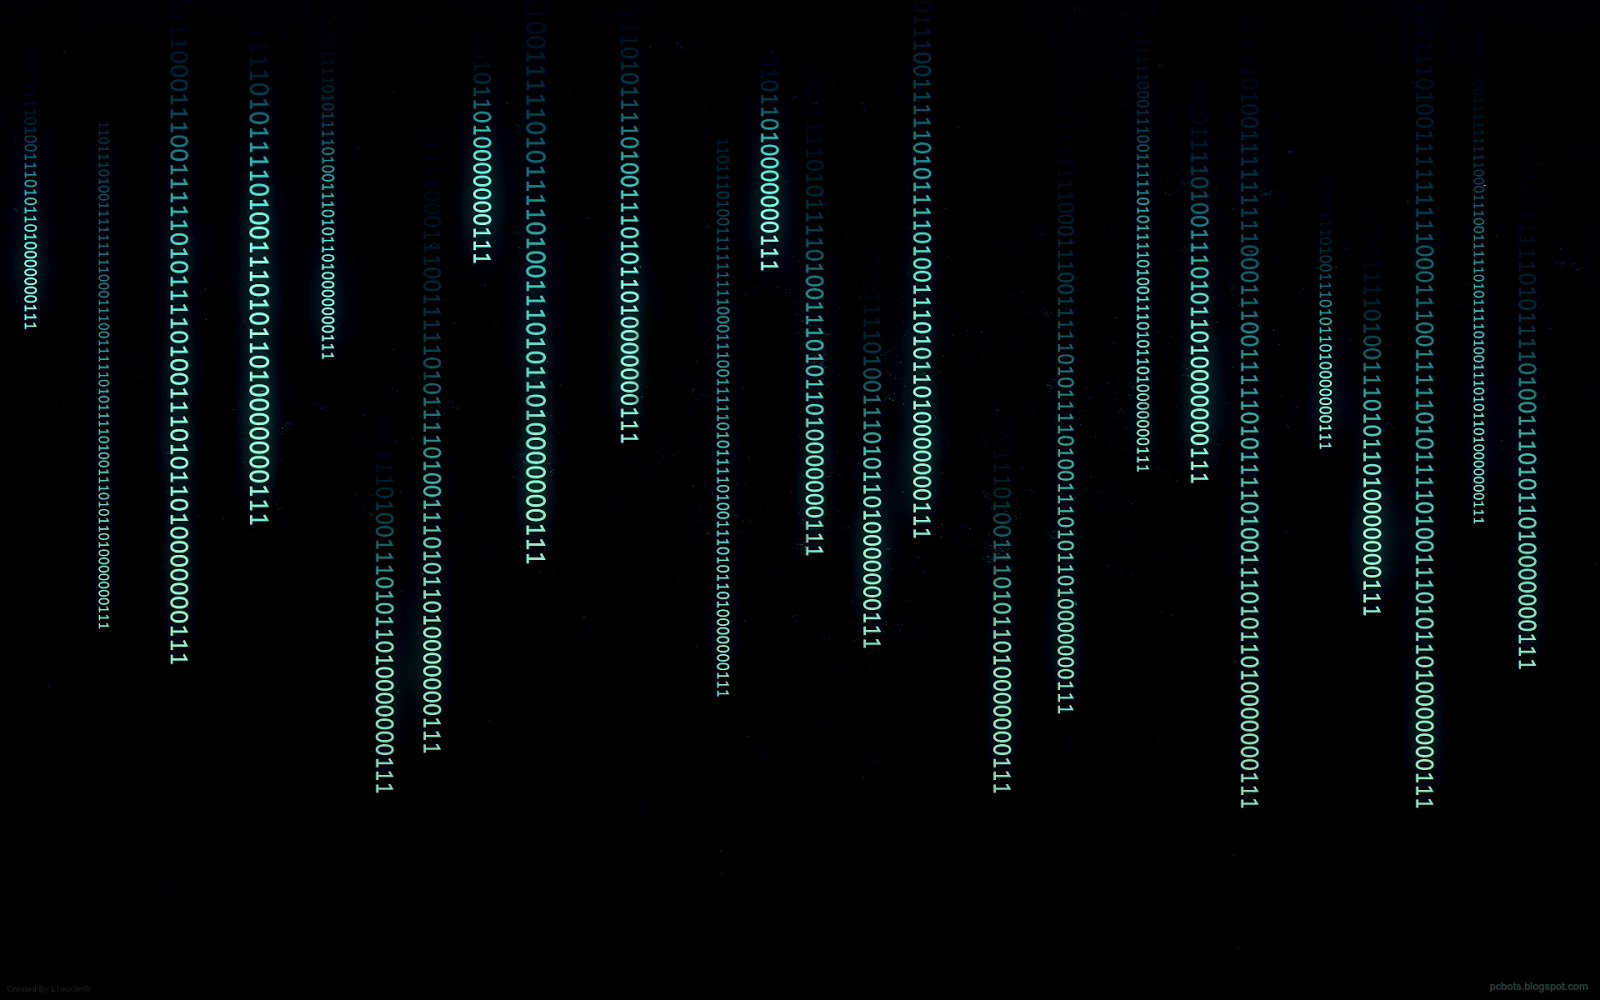 Hackers Wallpaper HD By Pcbots   Part IX PCbots Labs Blog 1600x1000